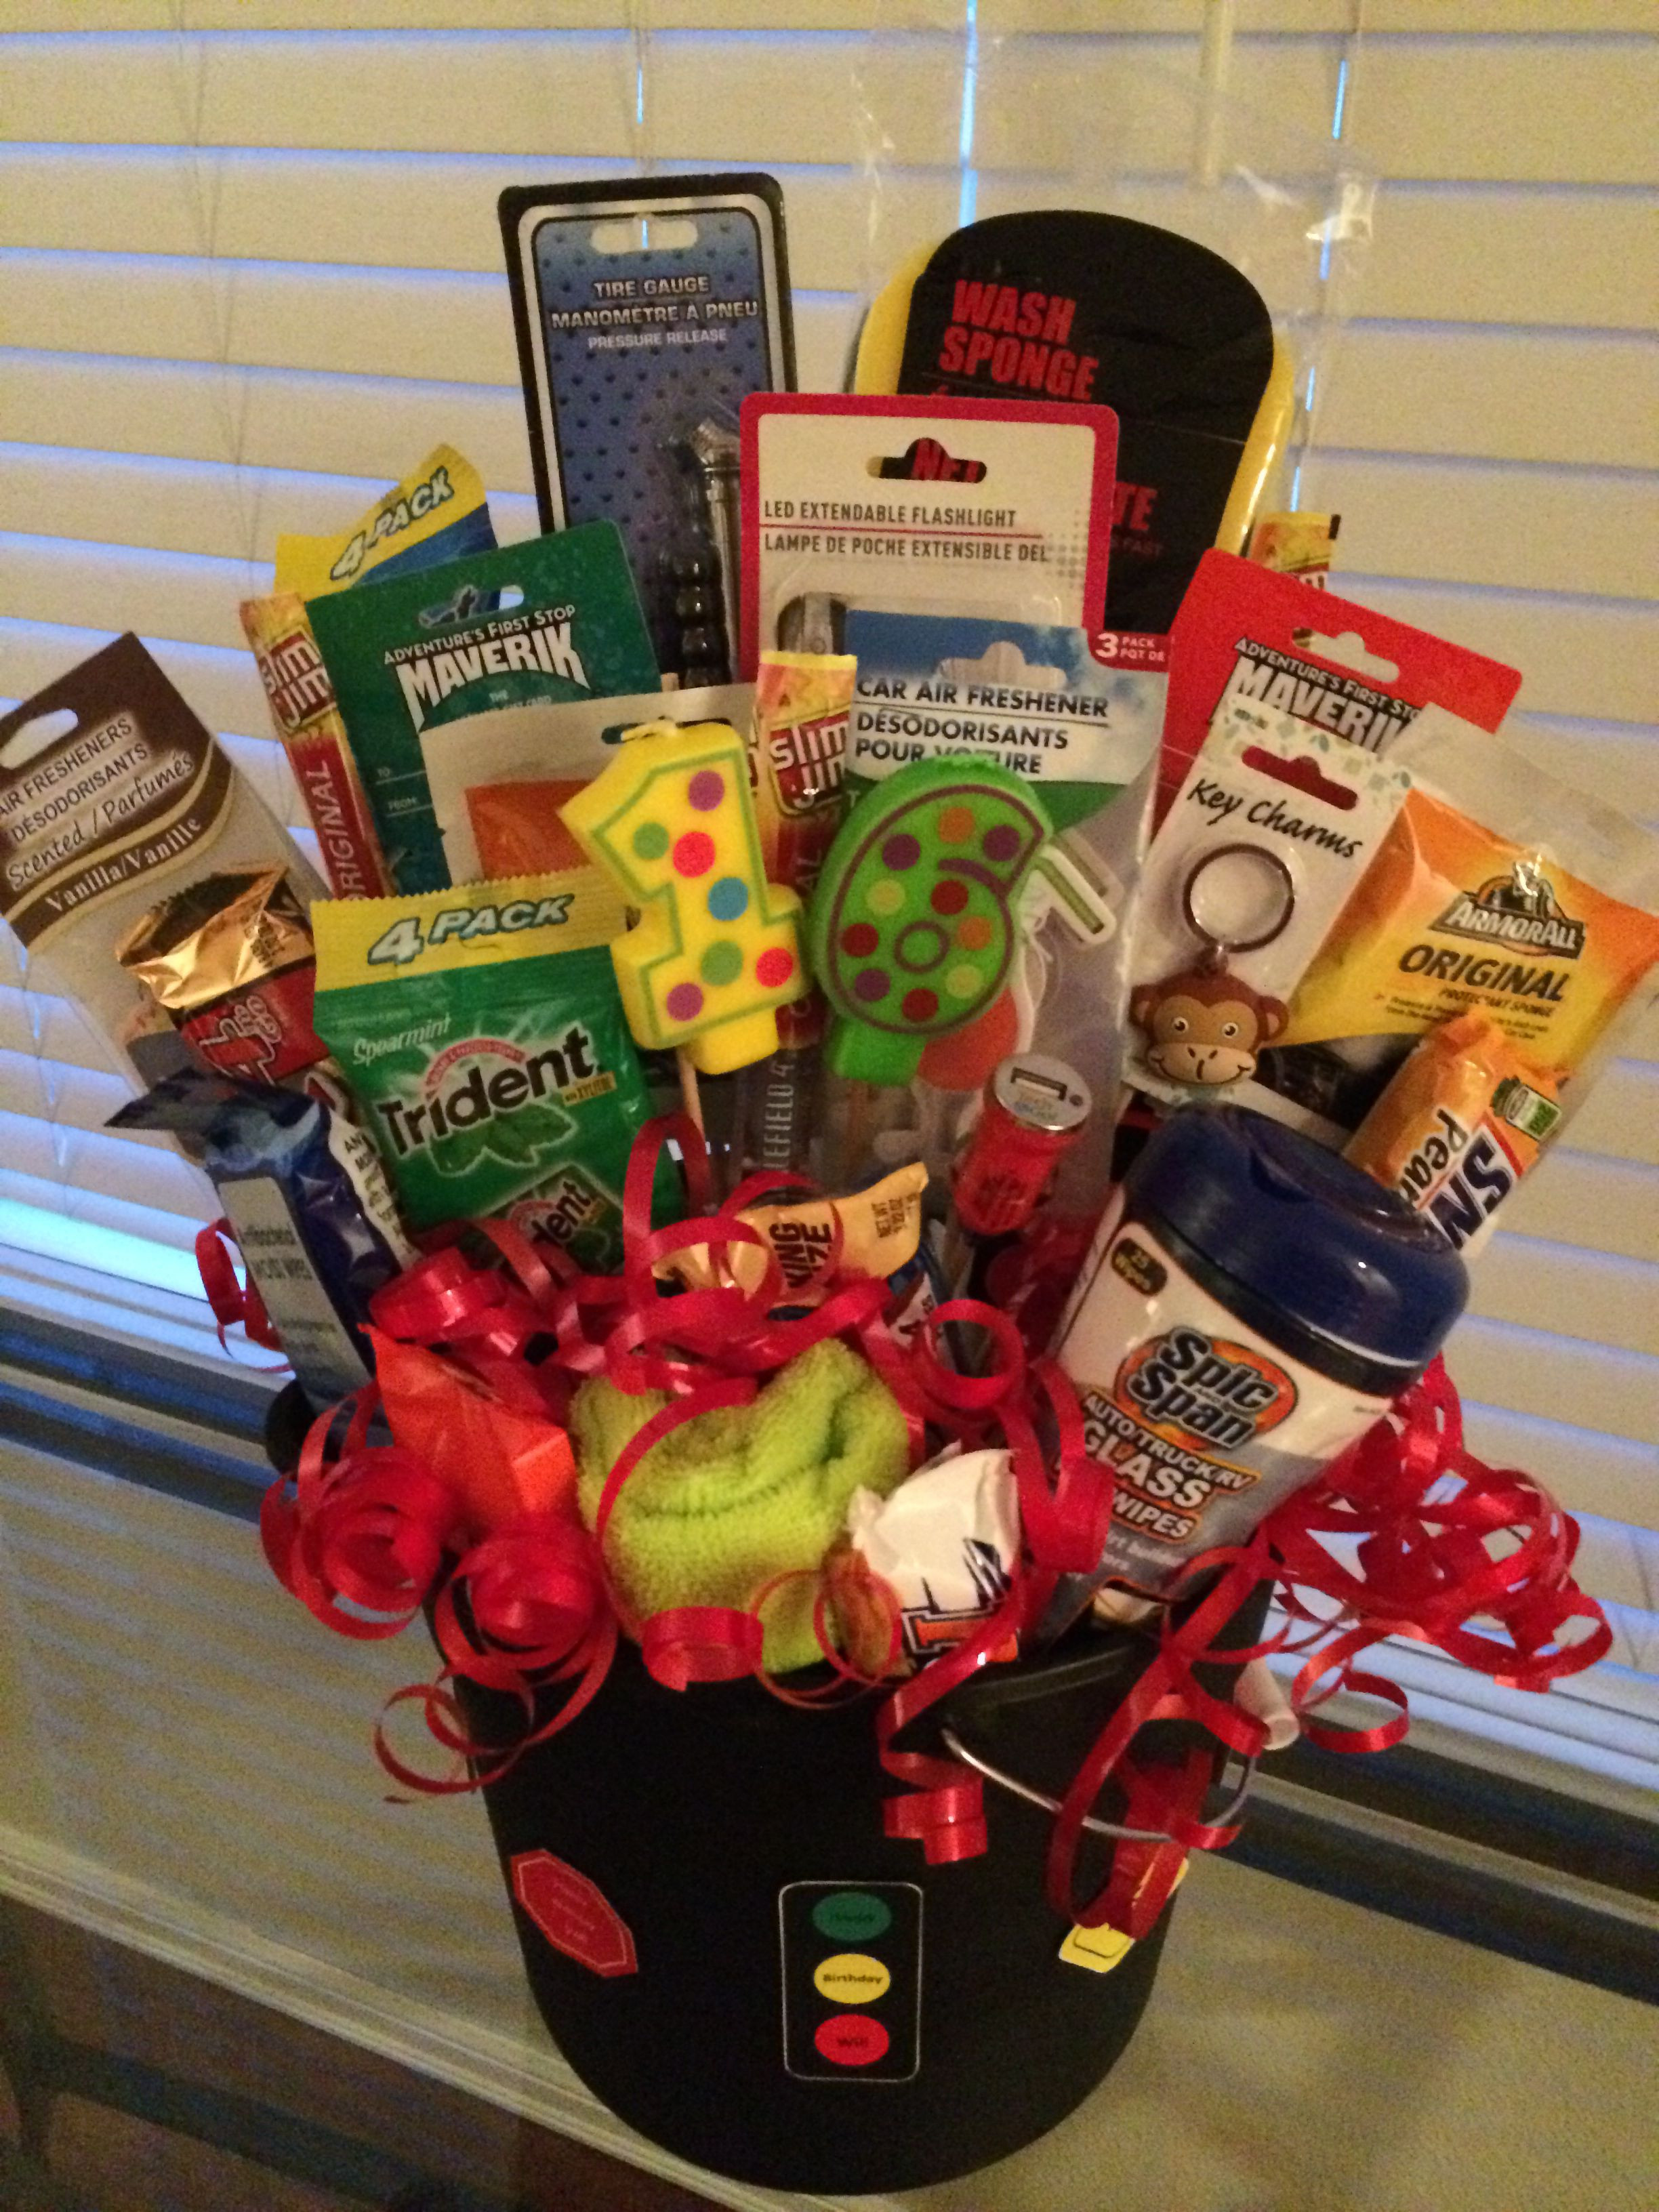 16Th Birthday Gift Ideas For Girls  Best 25 16th birthday present ideas ideas on Pinterest